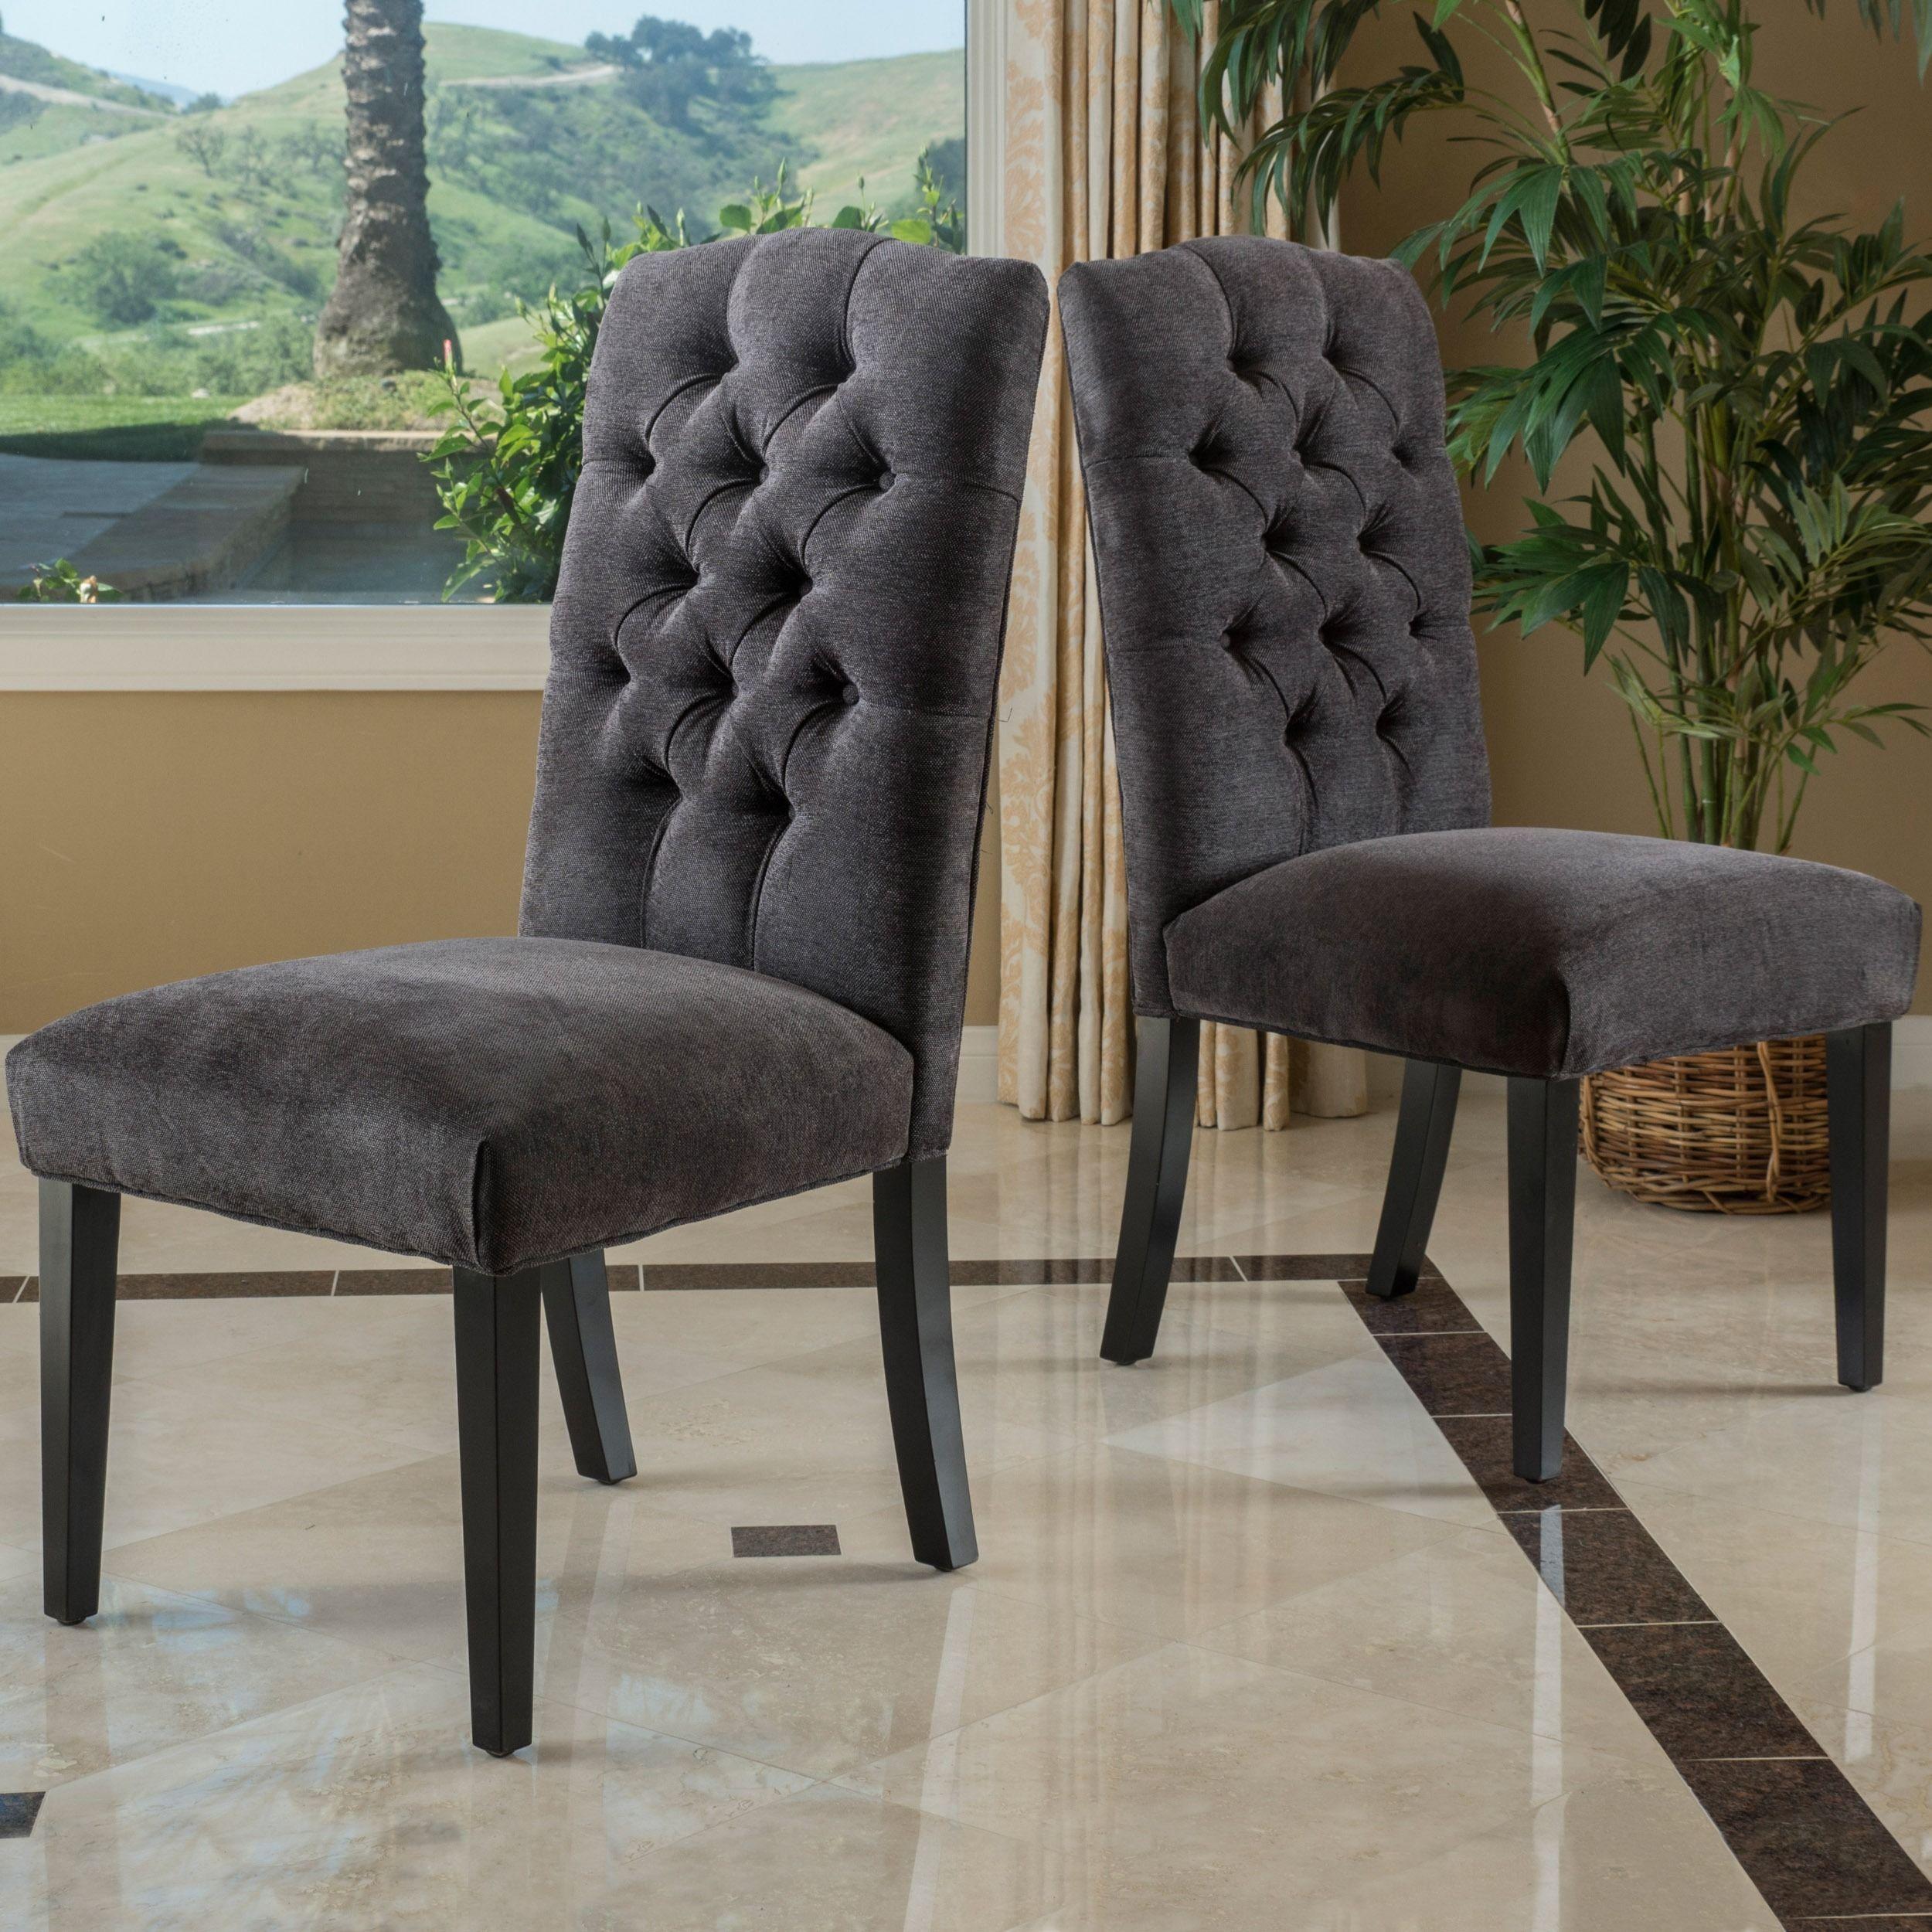 Our Best Dining Room Bar Furniture Deals Tufted Dining Chairs Fabric Dining Chairs Dining Chairs